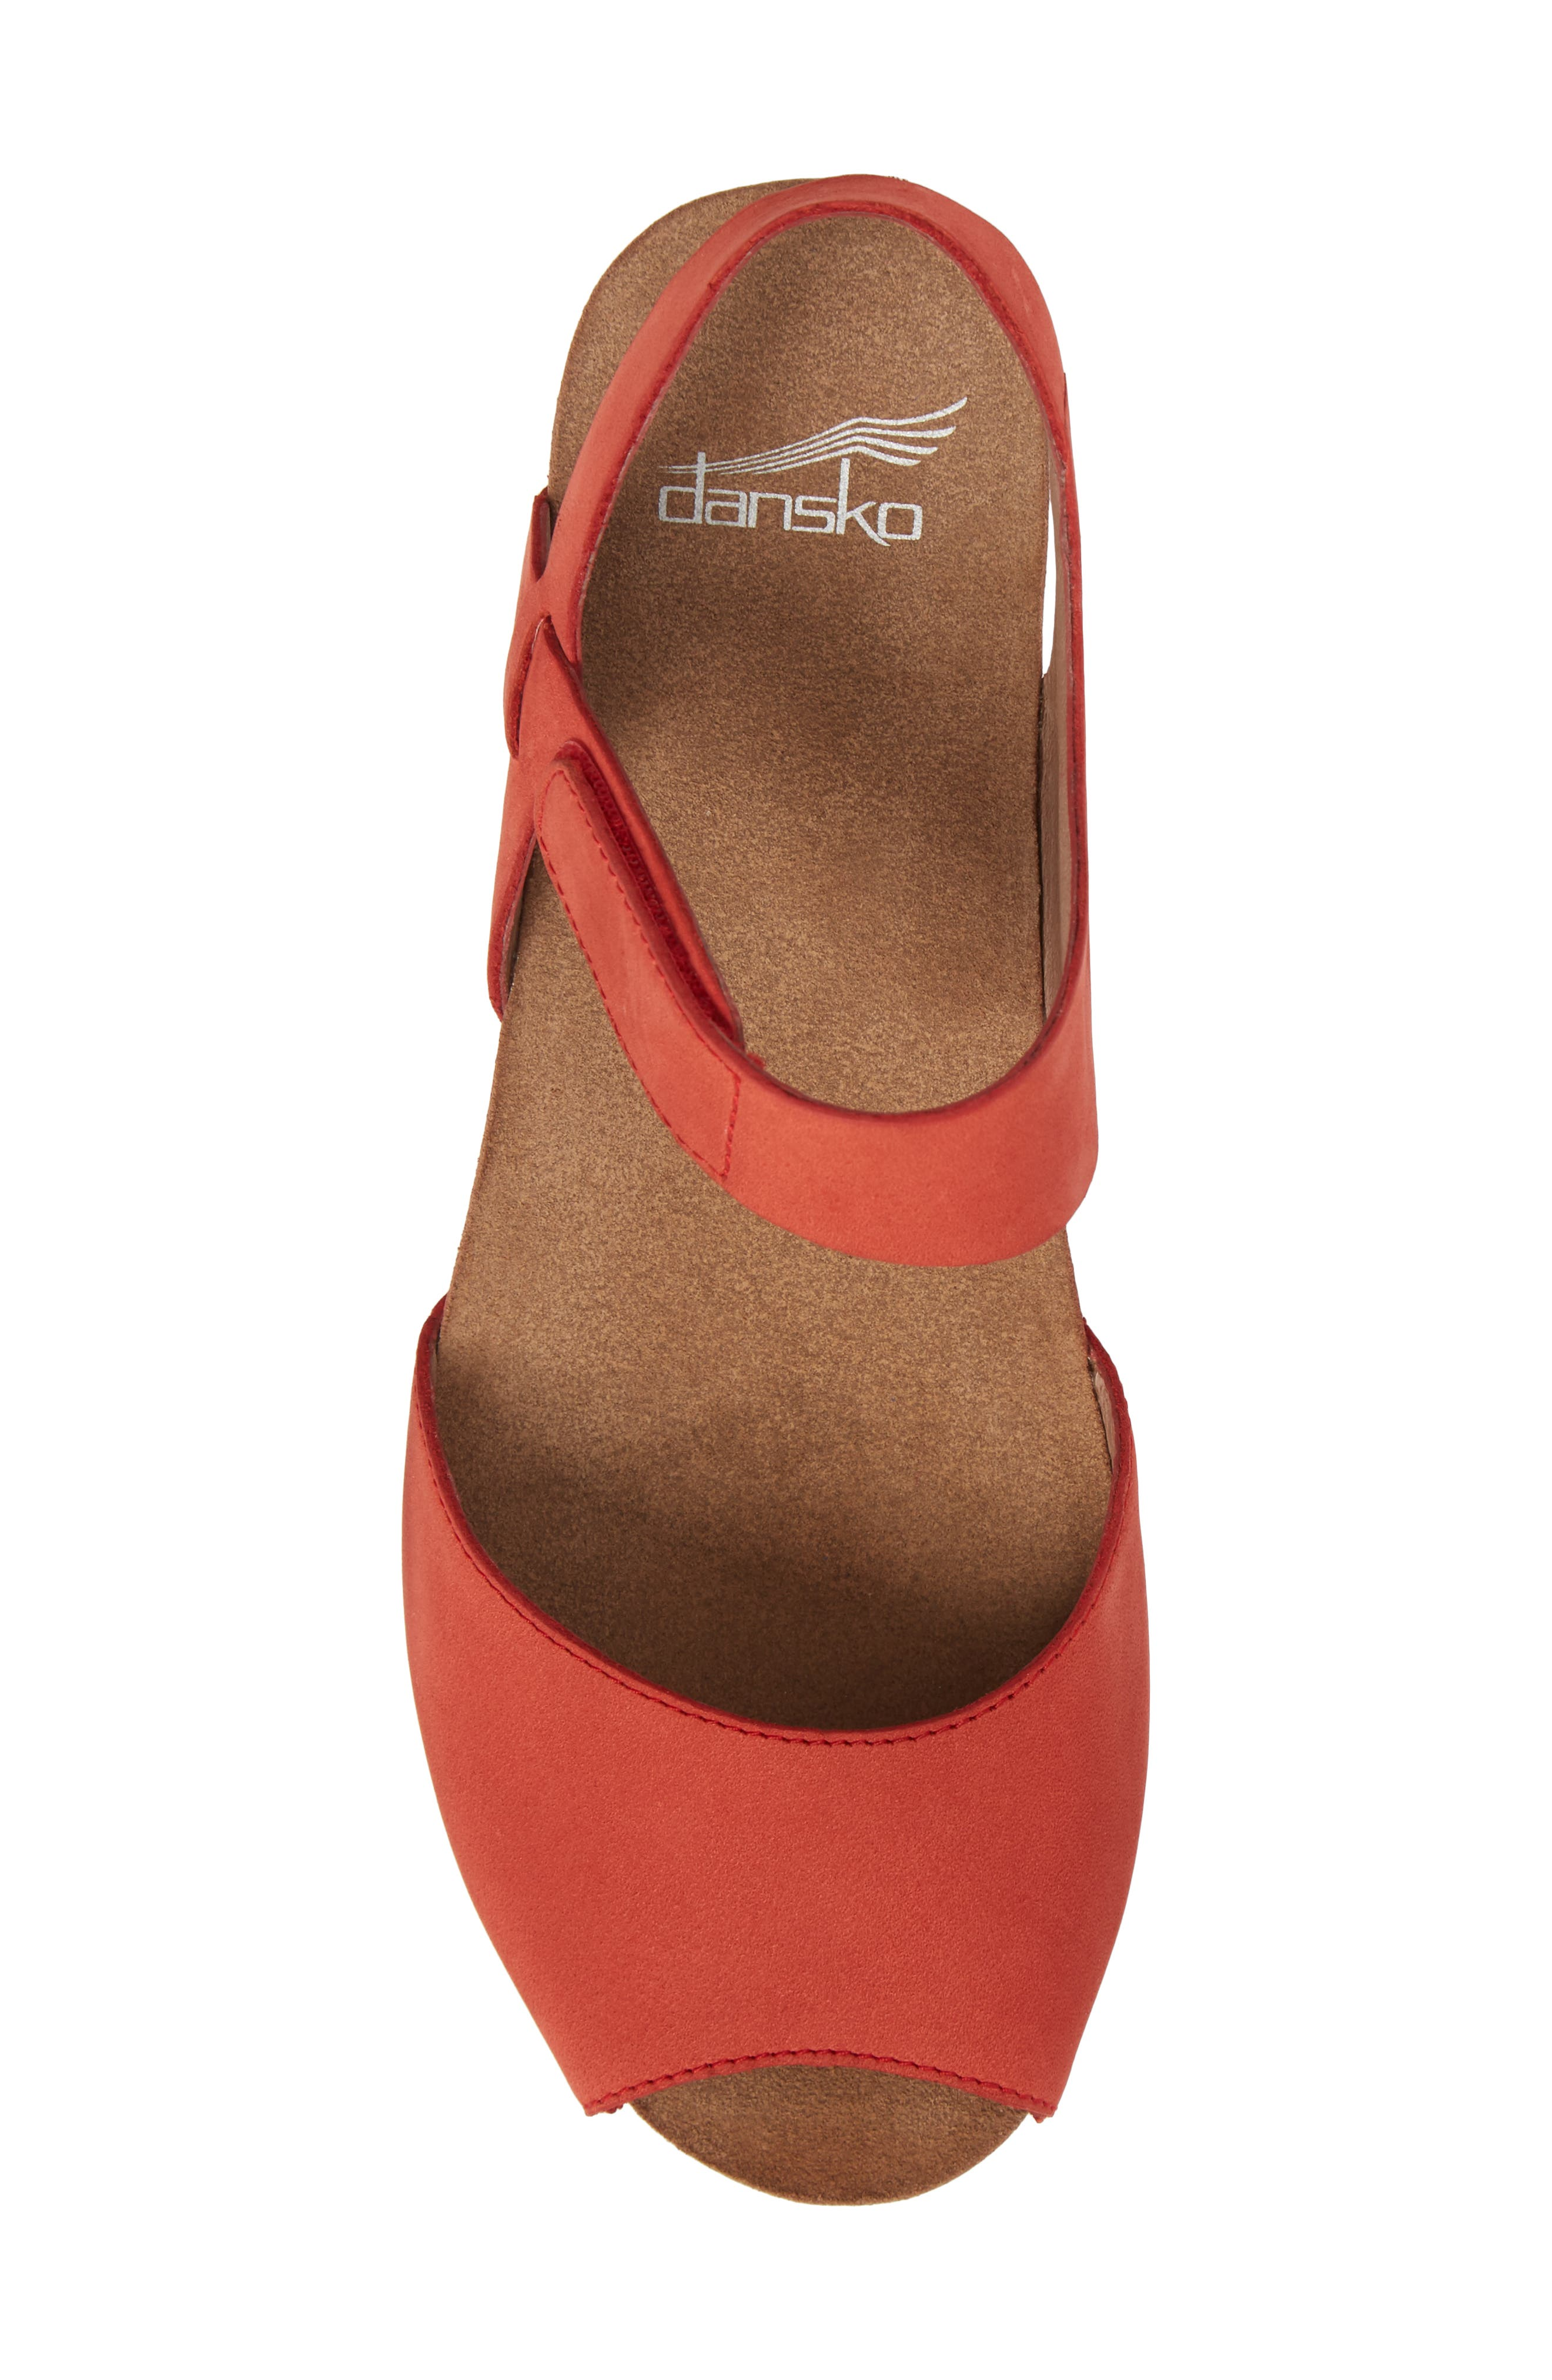 Vera Sandal,                             Alternate thumbnail 5, color,                             Tomato Milled Nubuck Leather